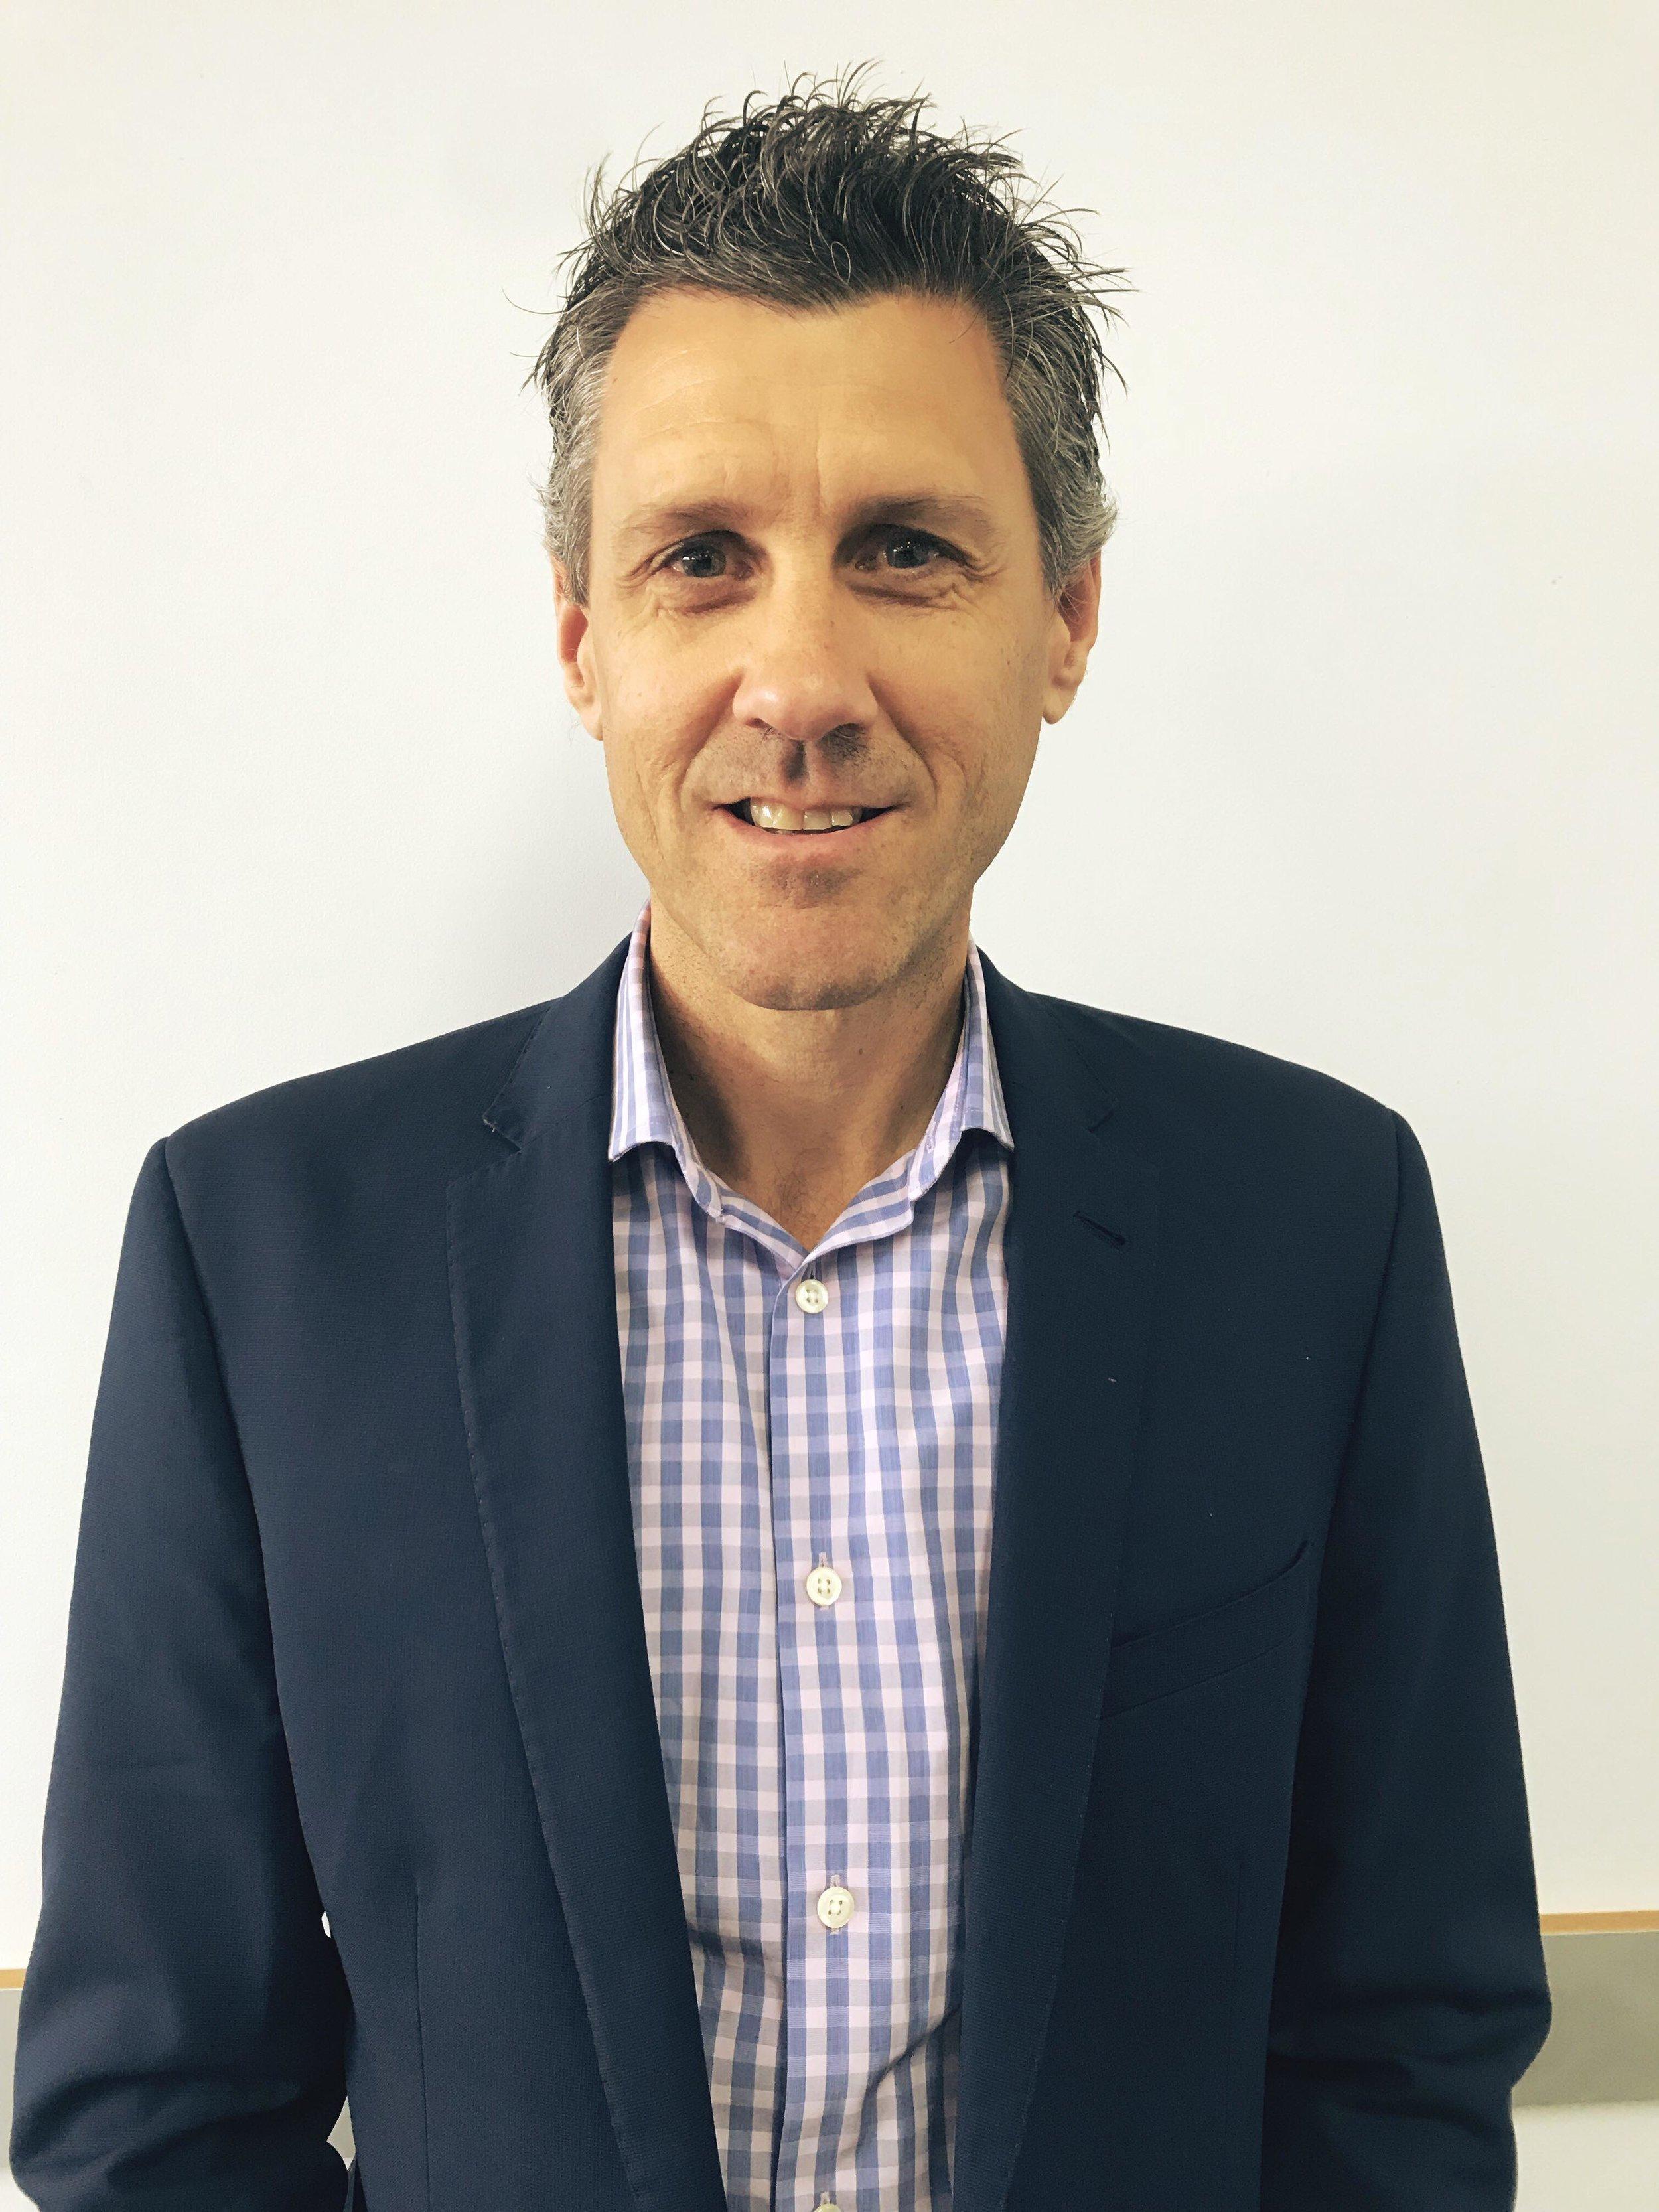 Steve Walker - Chief Executive Officer